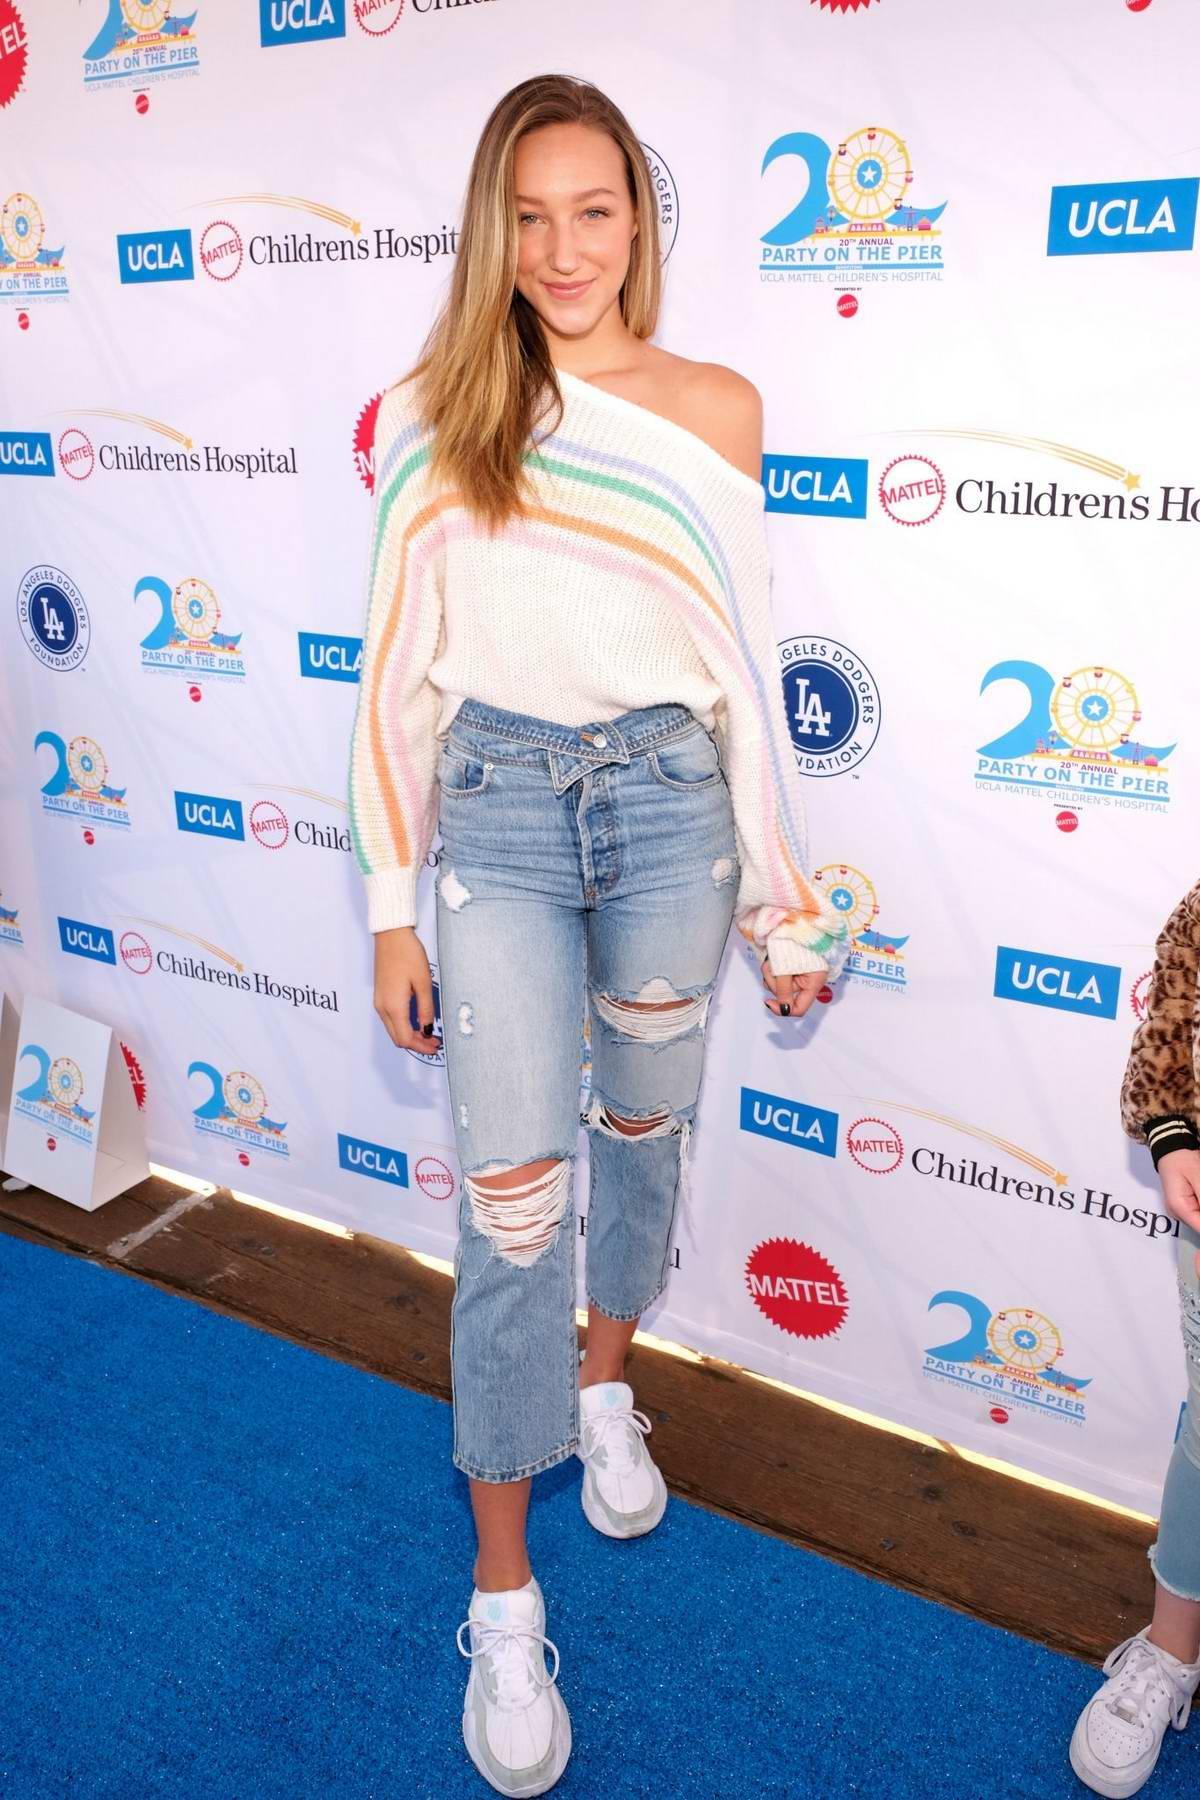 Ava Michelle attends UCLA Mattel Children's Hospital's 20th Annual Party On The Pier in Santa Monica, California